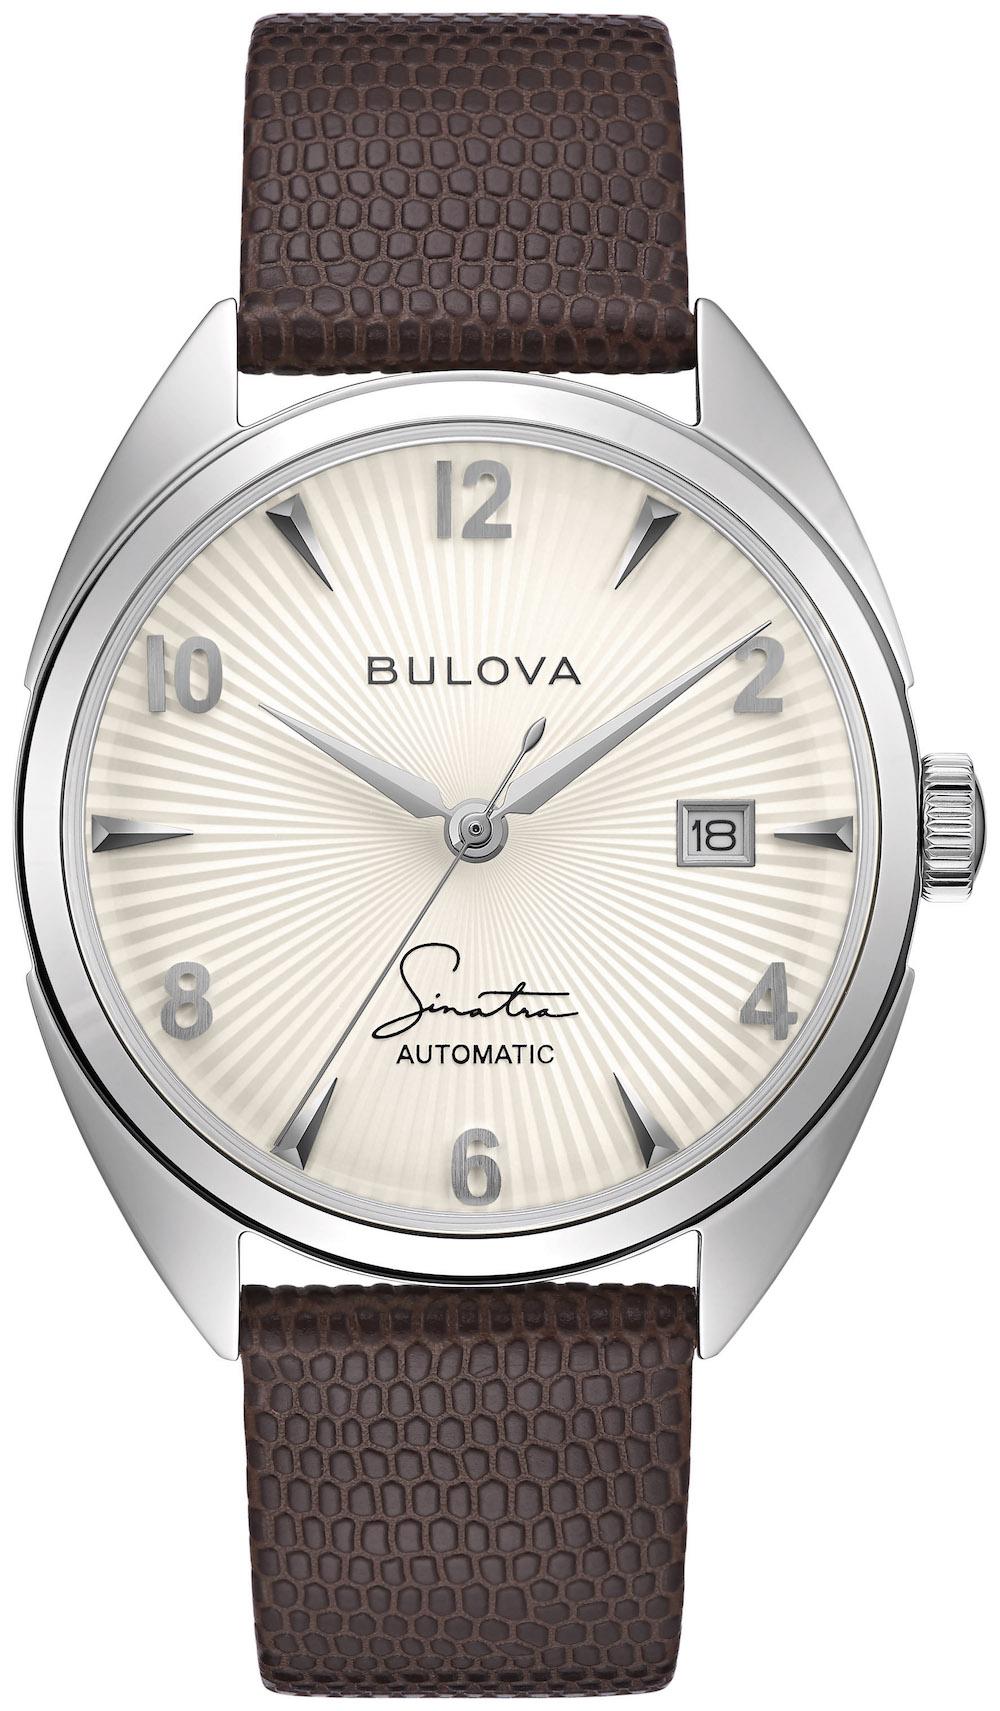 Bulova Frank Sinatra watches